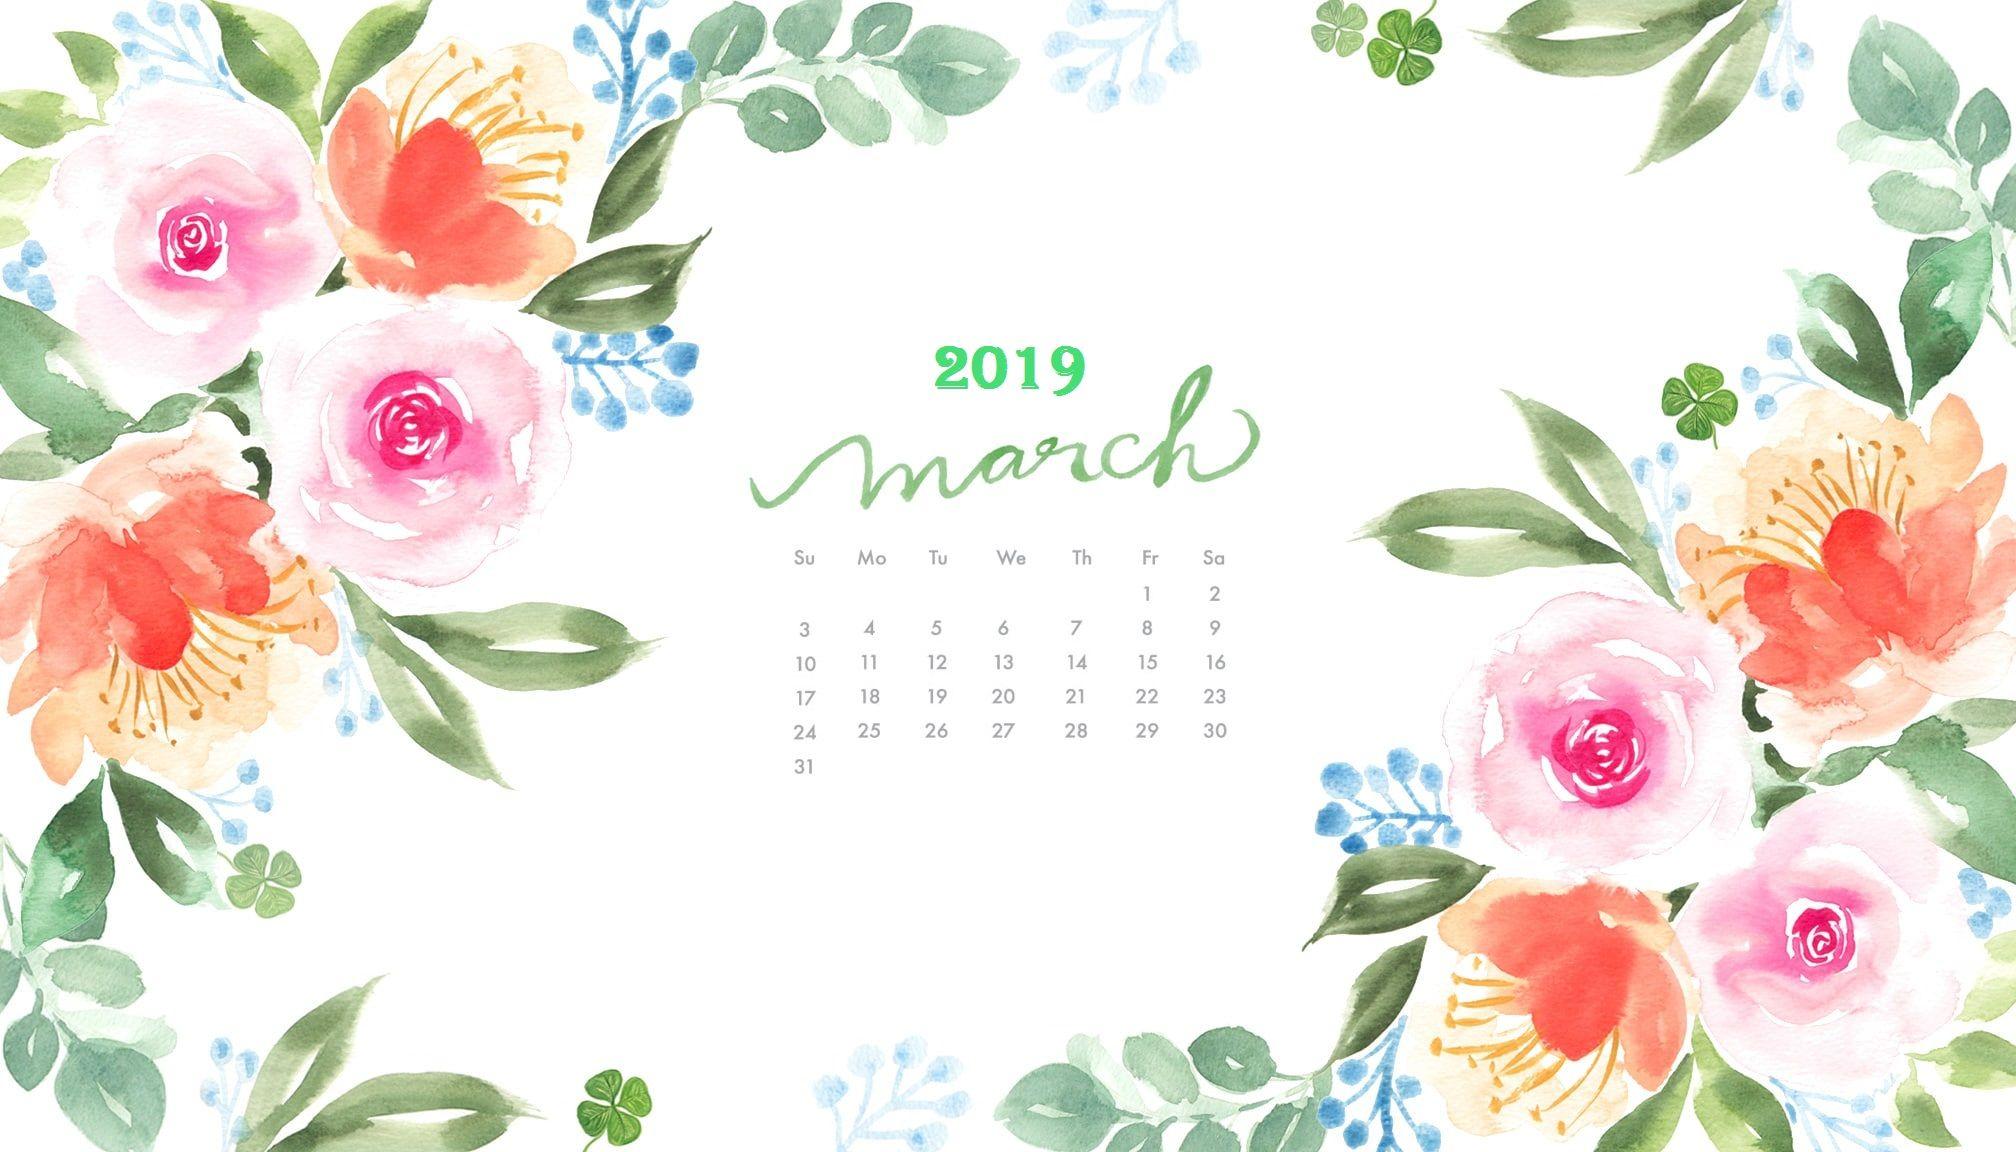 March 2019 Watercolor Calendar Wallpaper Monthly Calendar 2016x1152